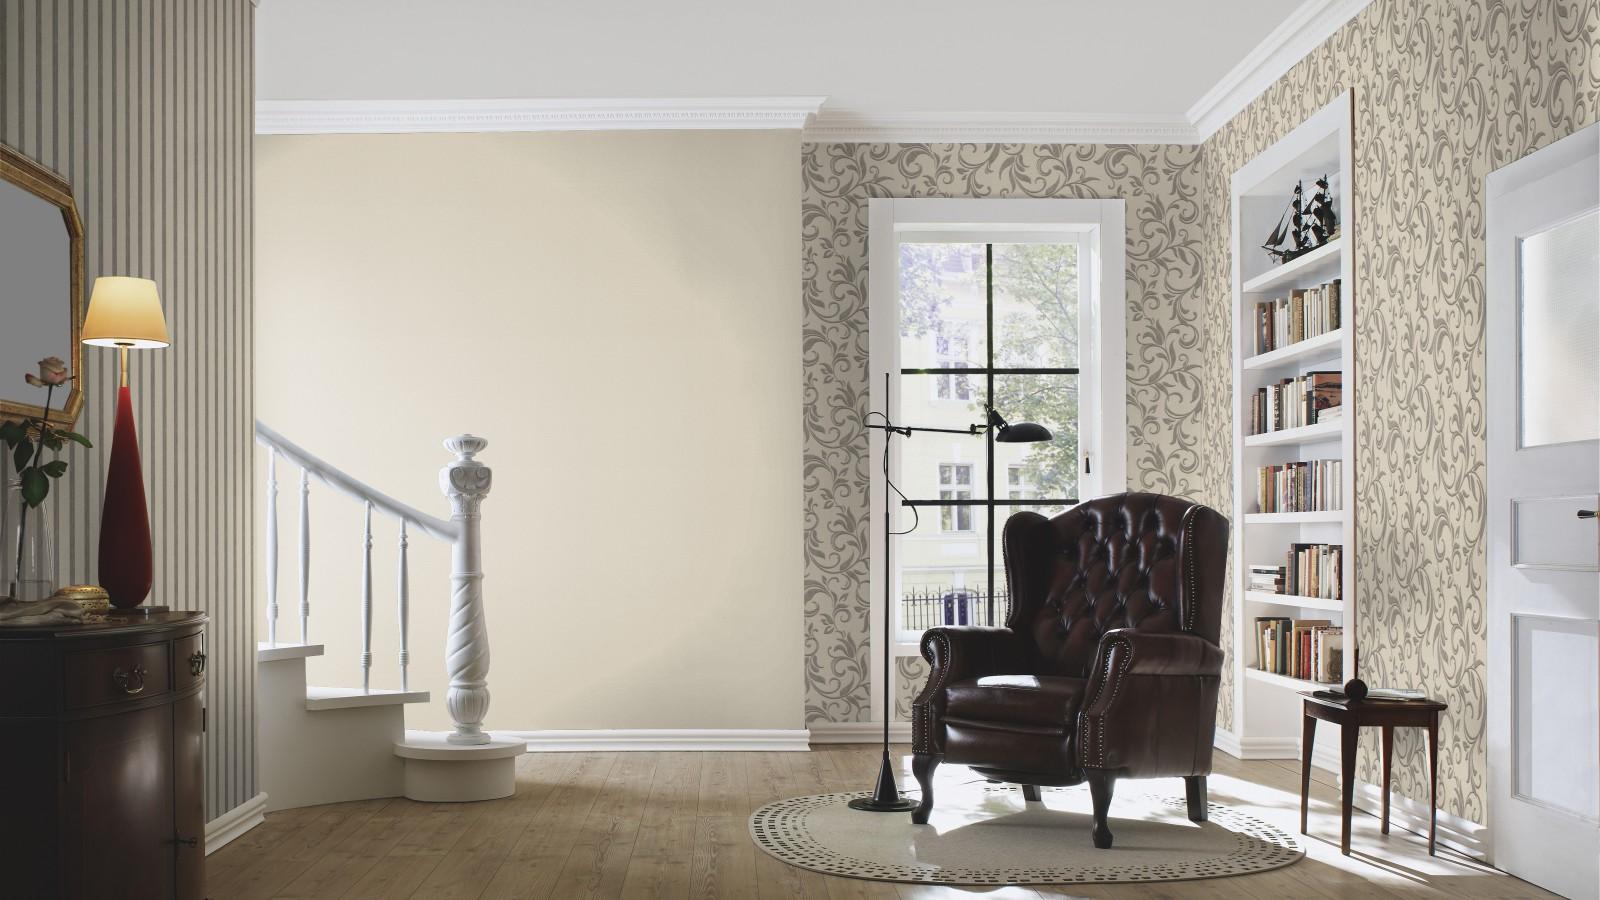 Rasch tapete beige grau ranken home vision 732504 - Tapete grau beige ...